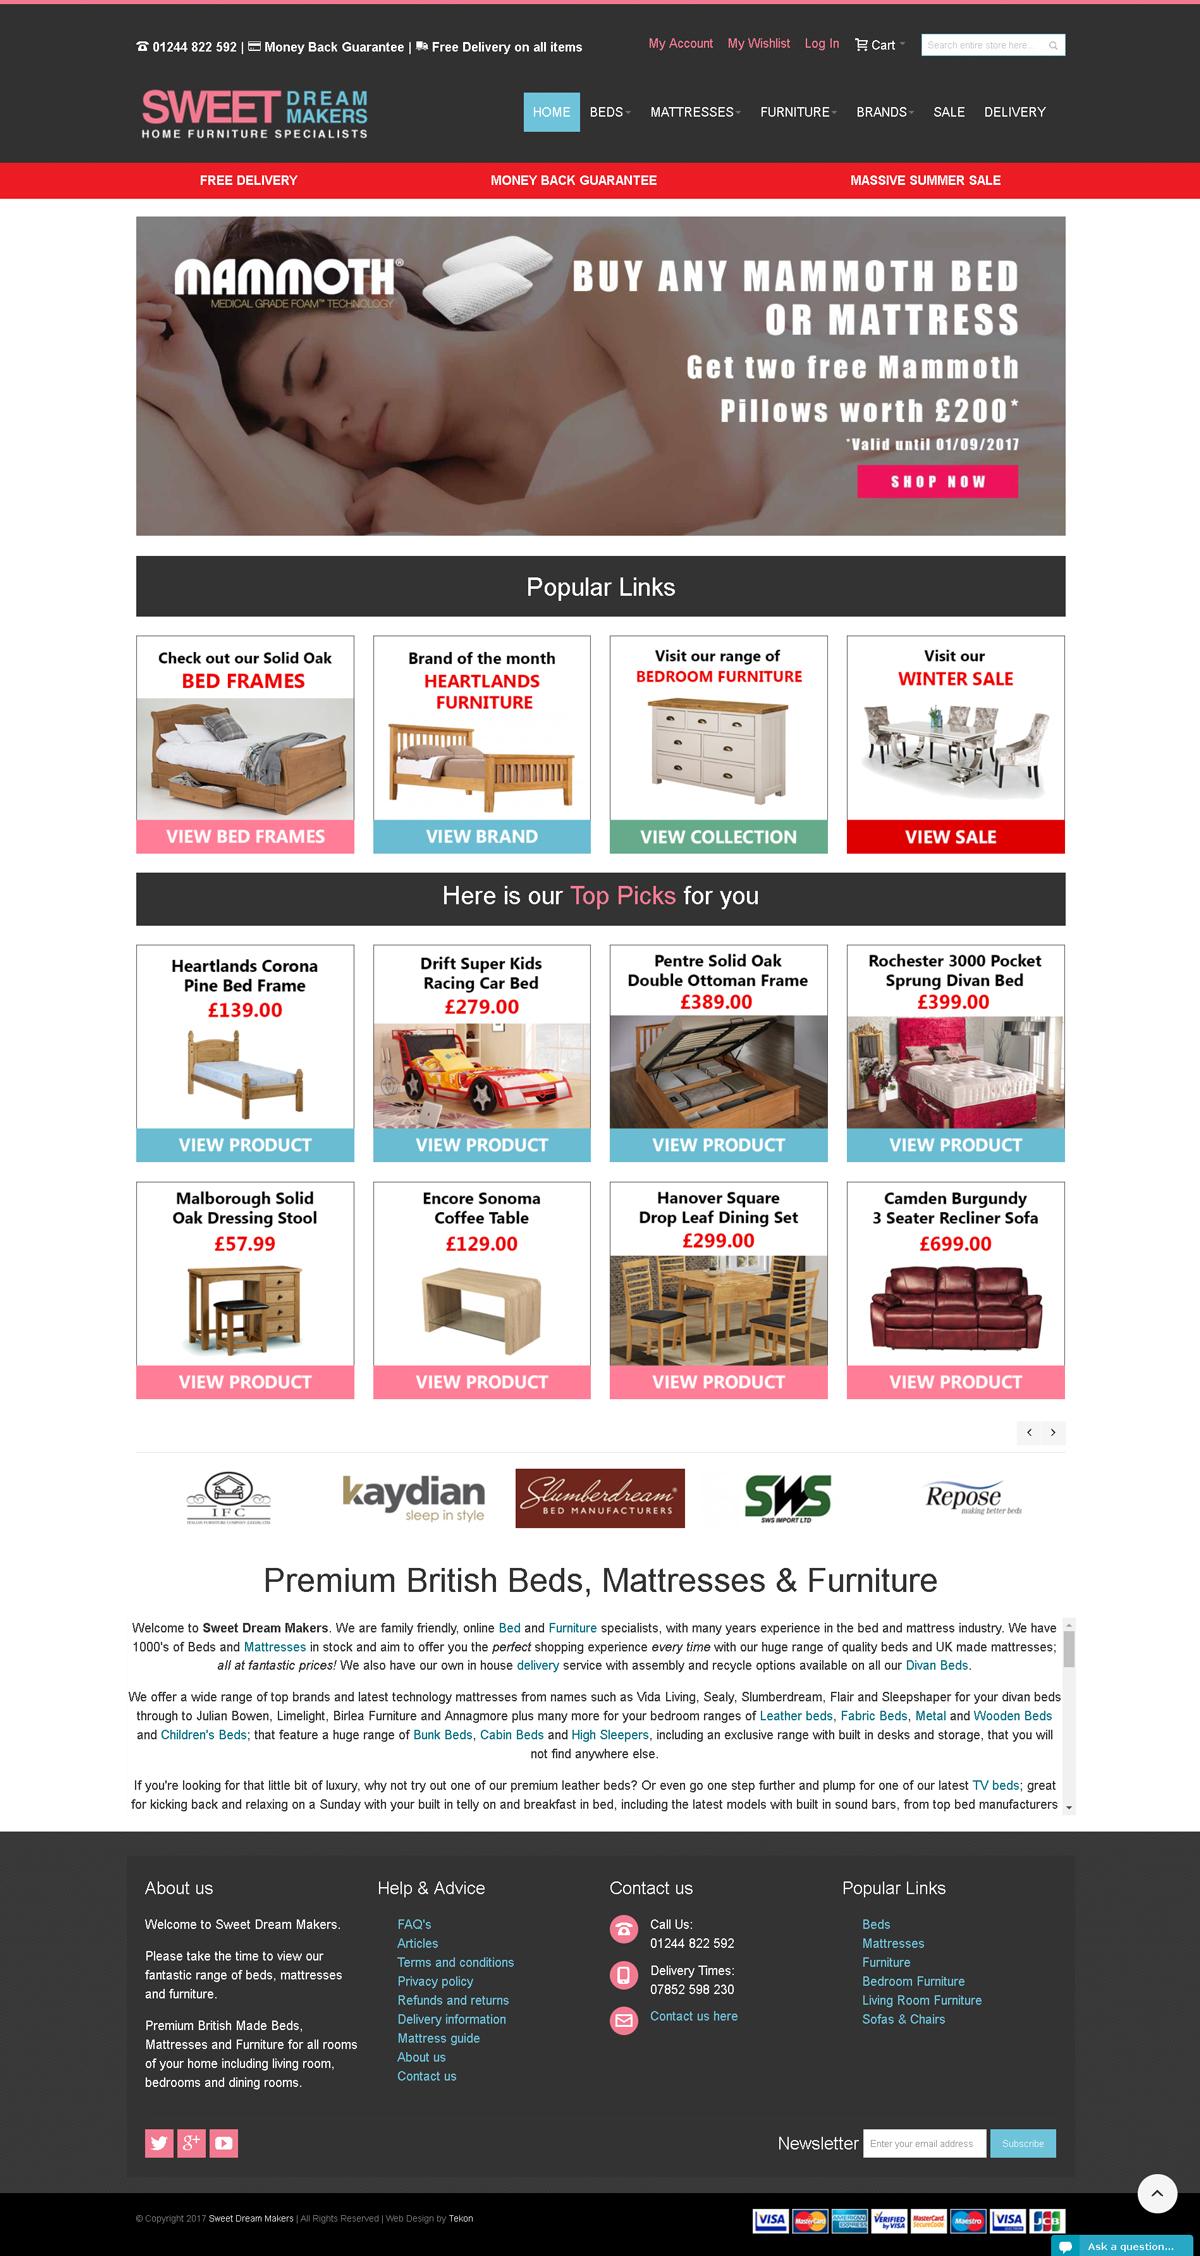 Tekon Website Design Liverpool - Sweet Dream Makers